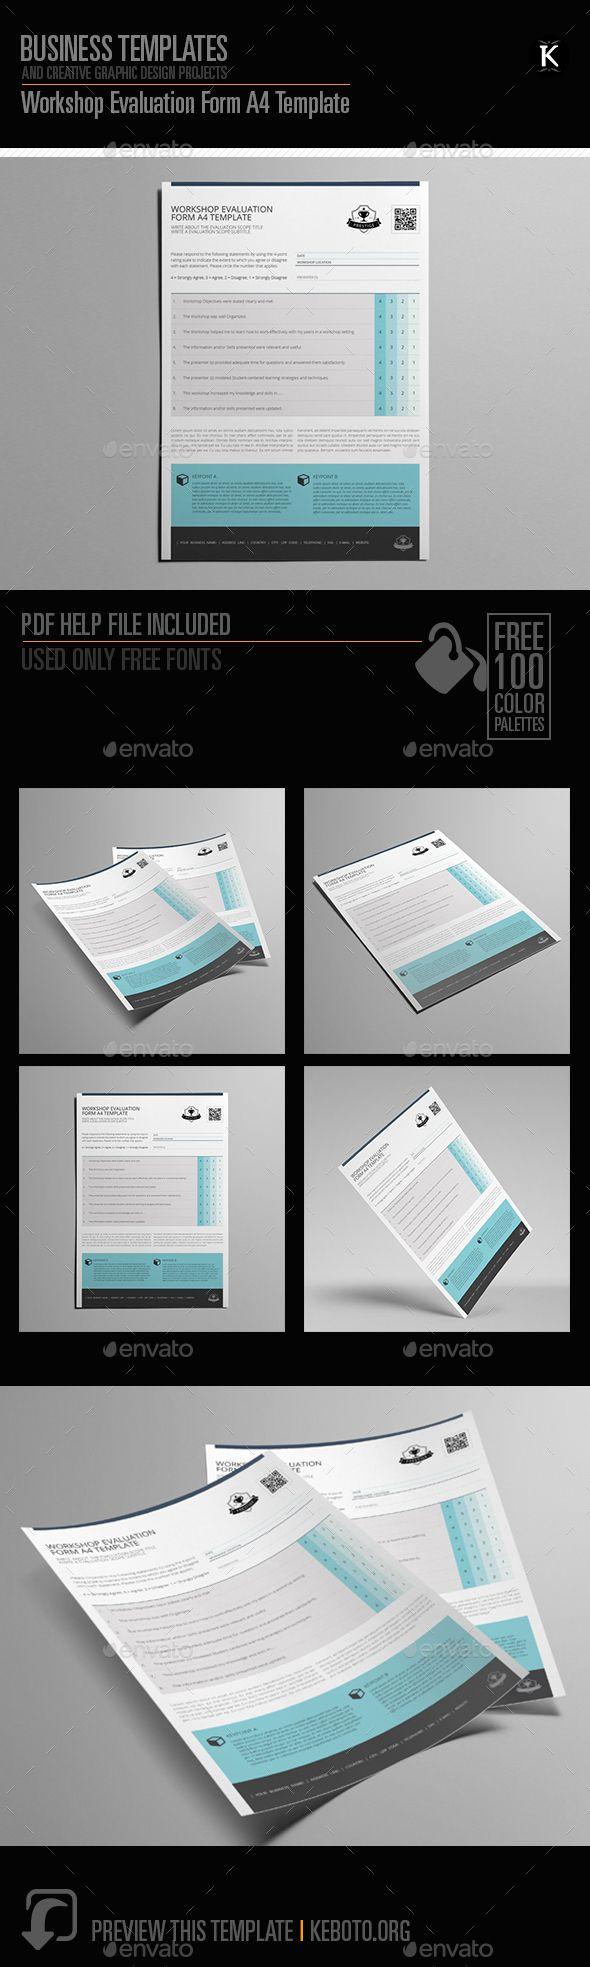 Workshop Evaluation Form A Template  Miscellaneous Print